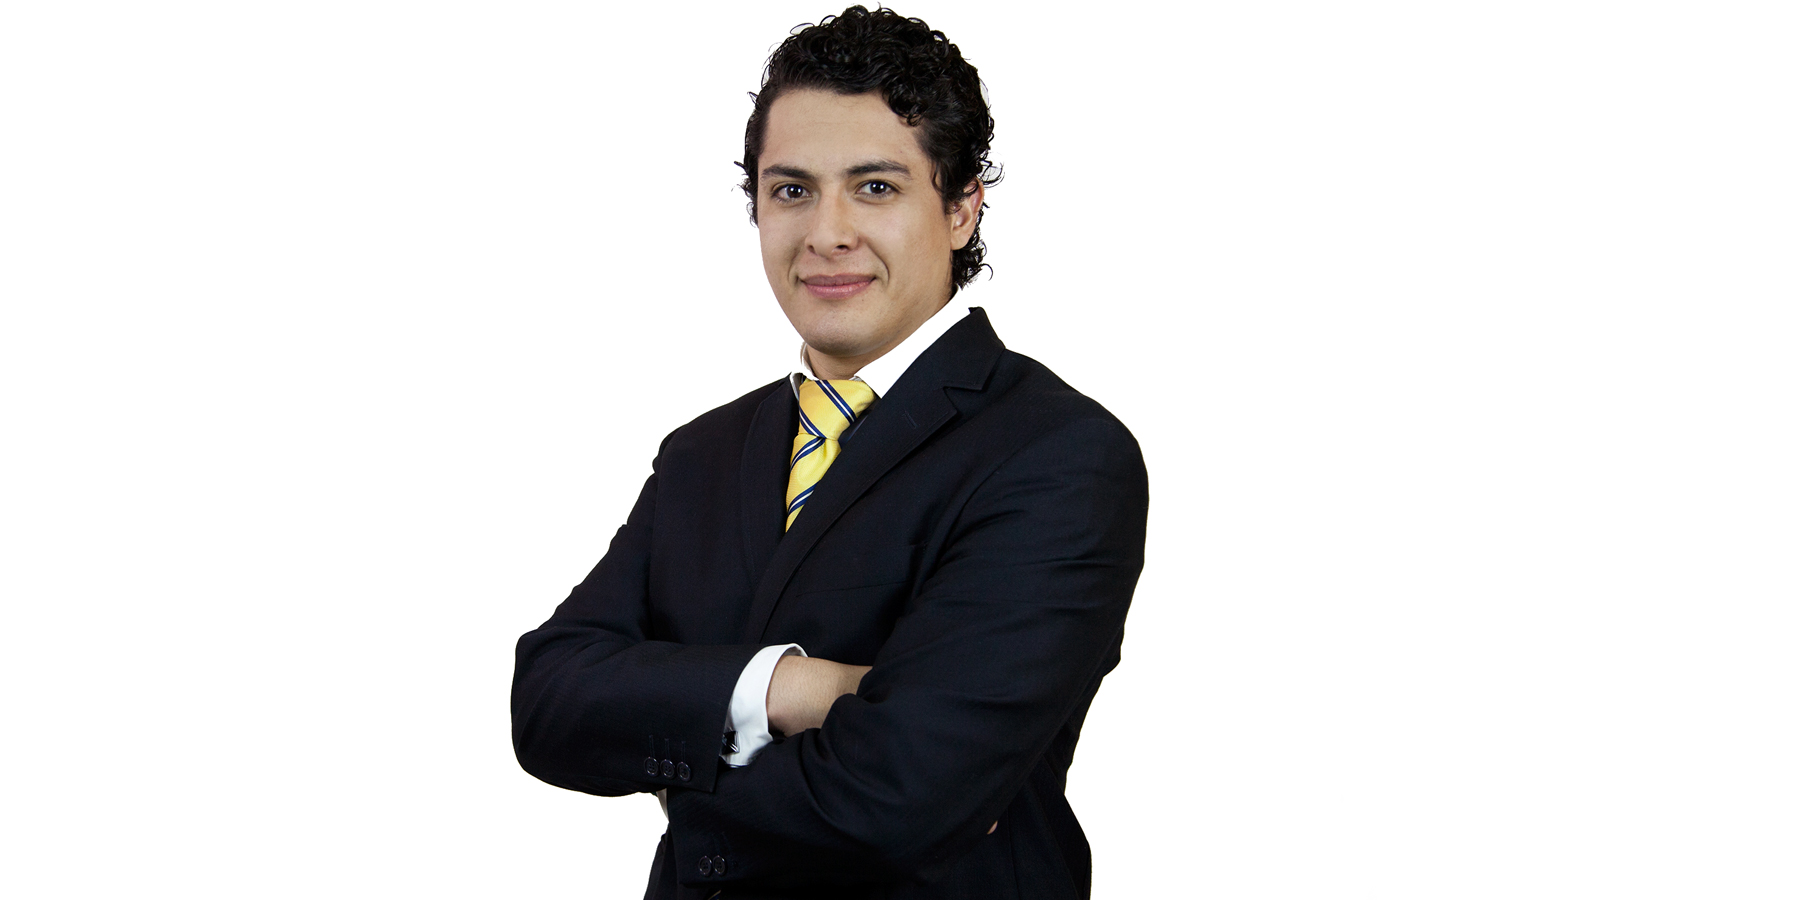 Lic. Jonathan Fernando Rosas Flores